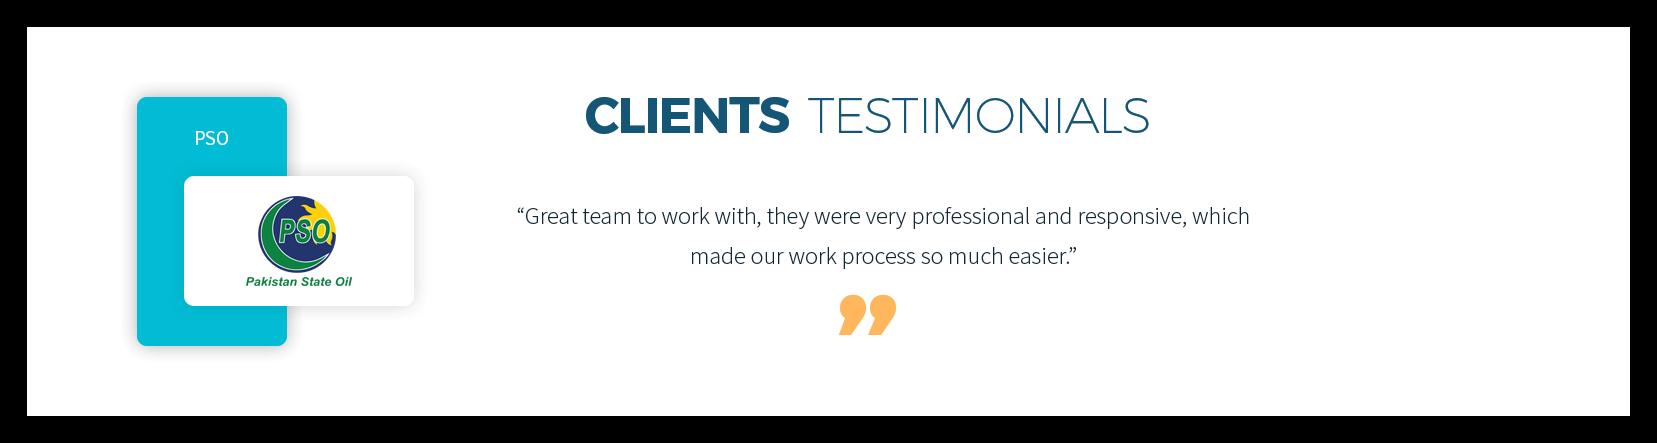 Client Testimonials3